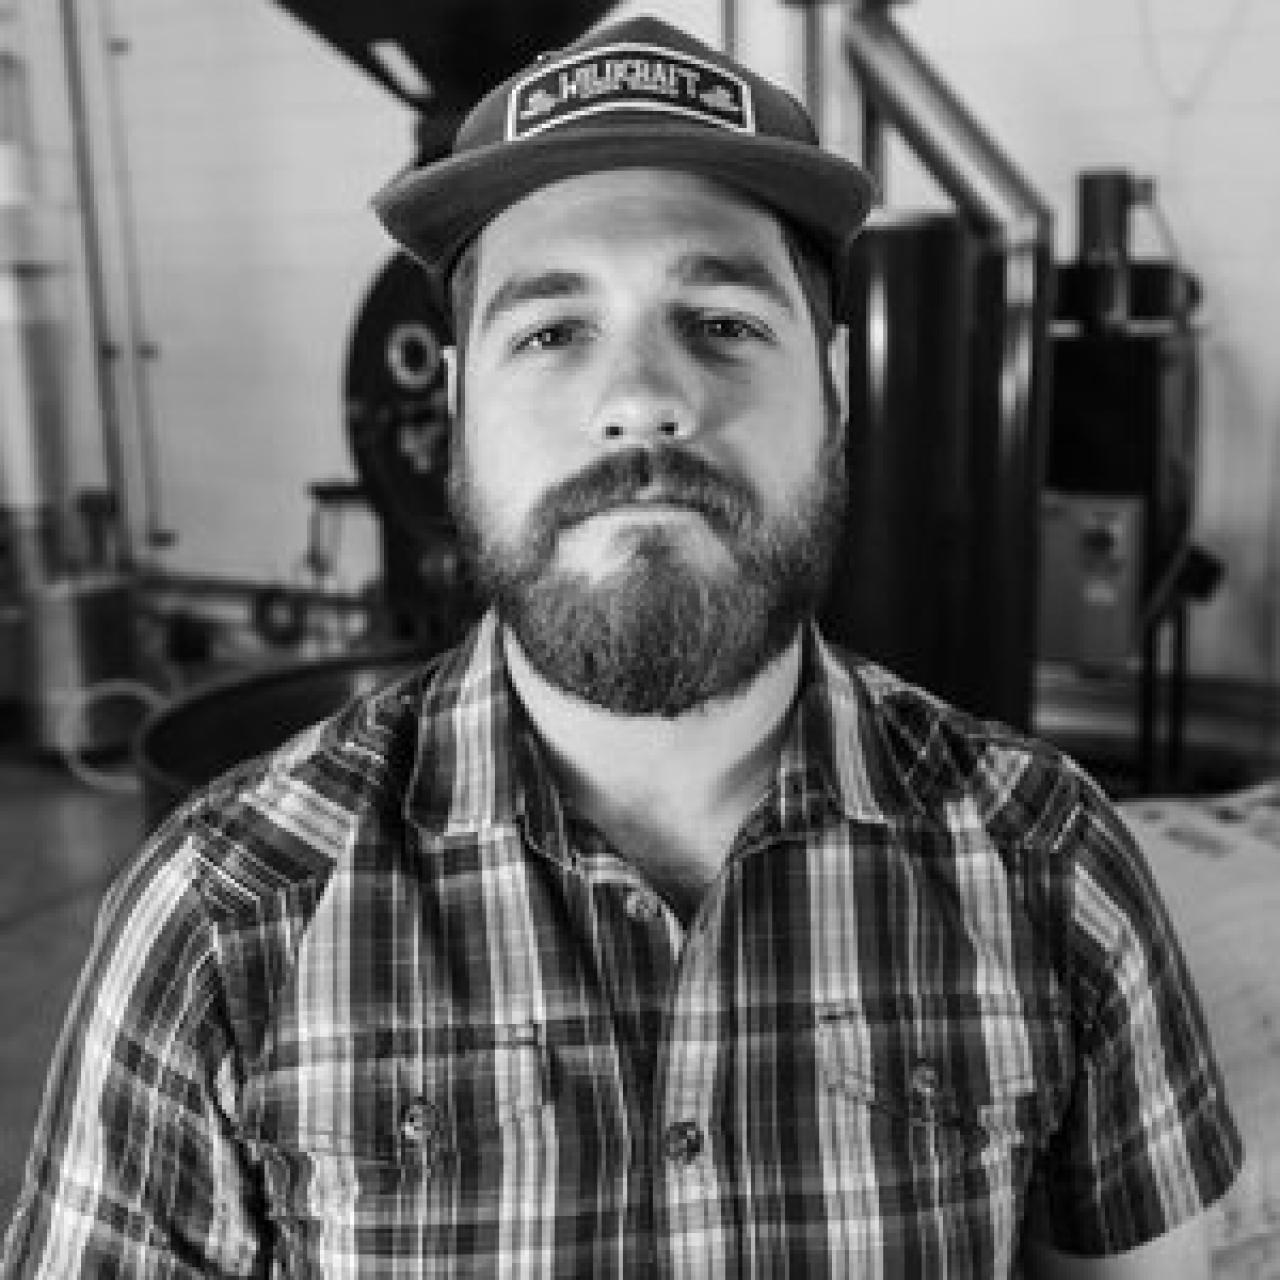 B&W headshot of a man with a beard wearing a cap and plaid shirt.